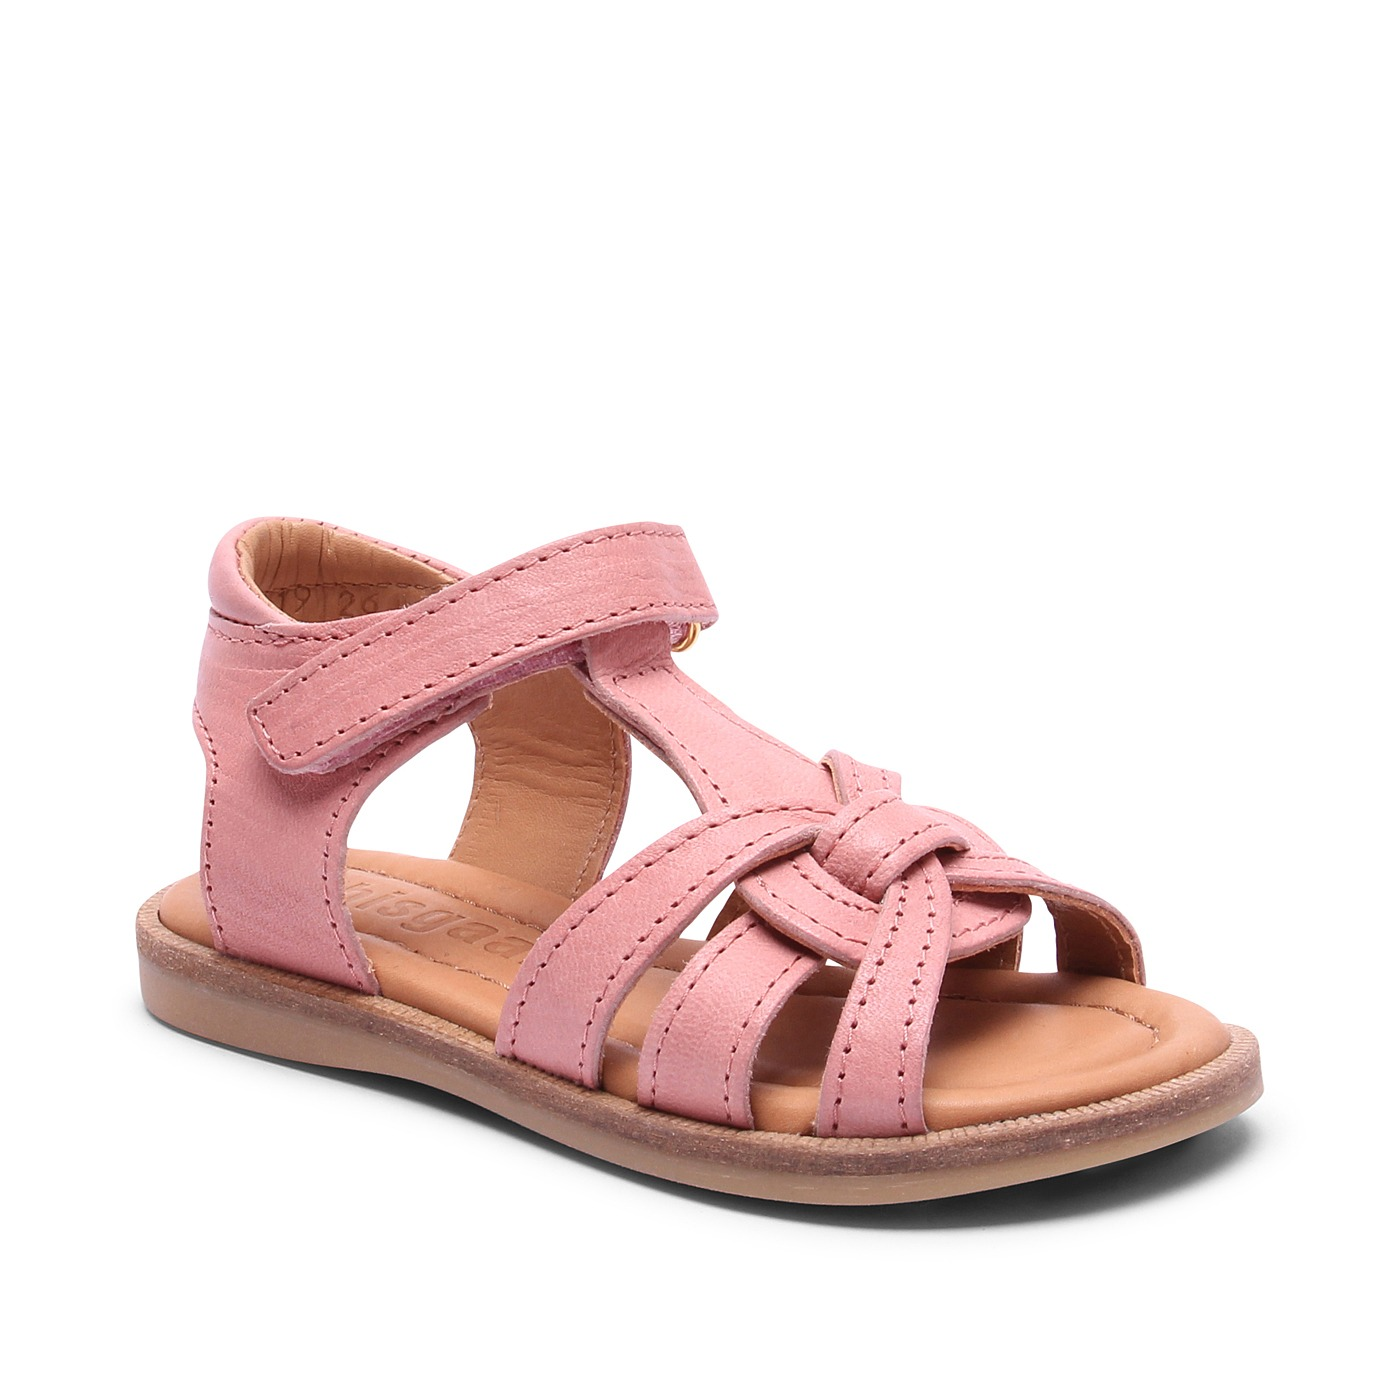 Bisgaard sandal, rose, 29